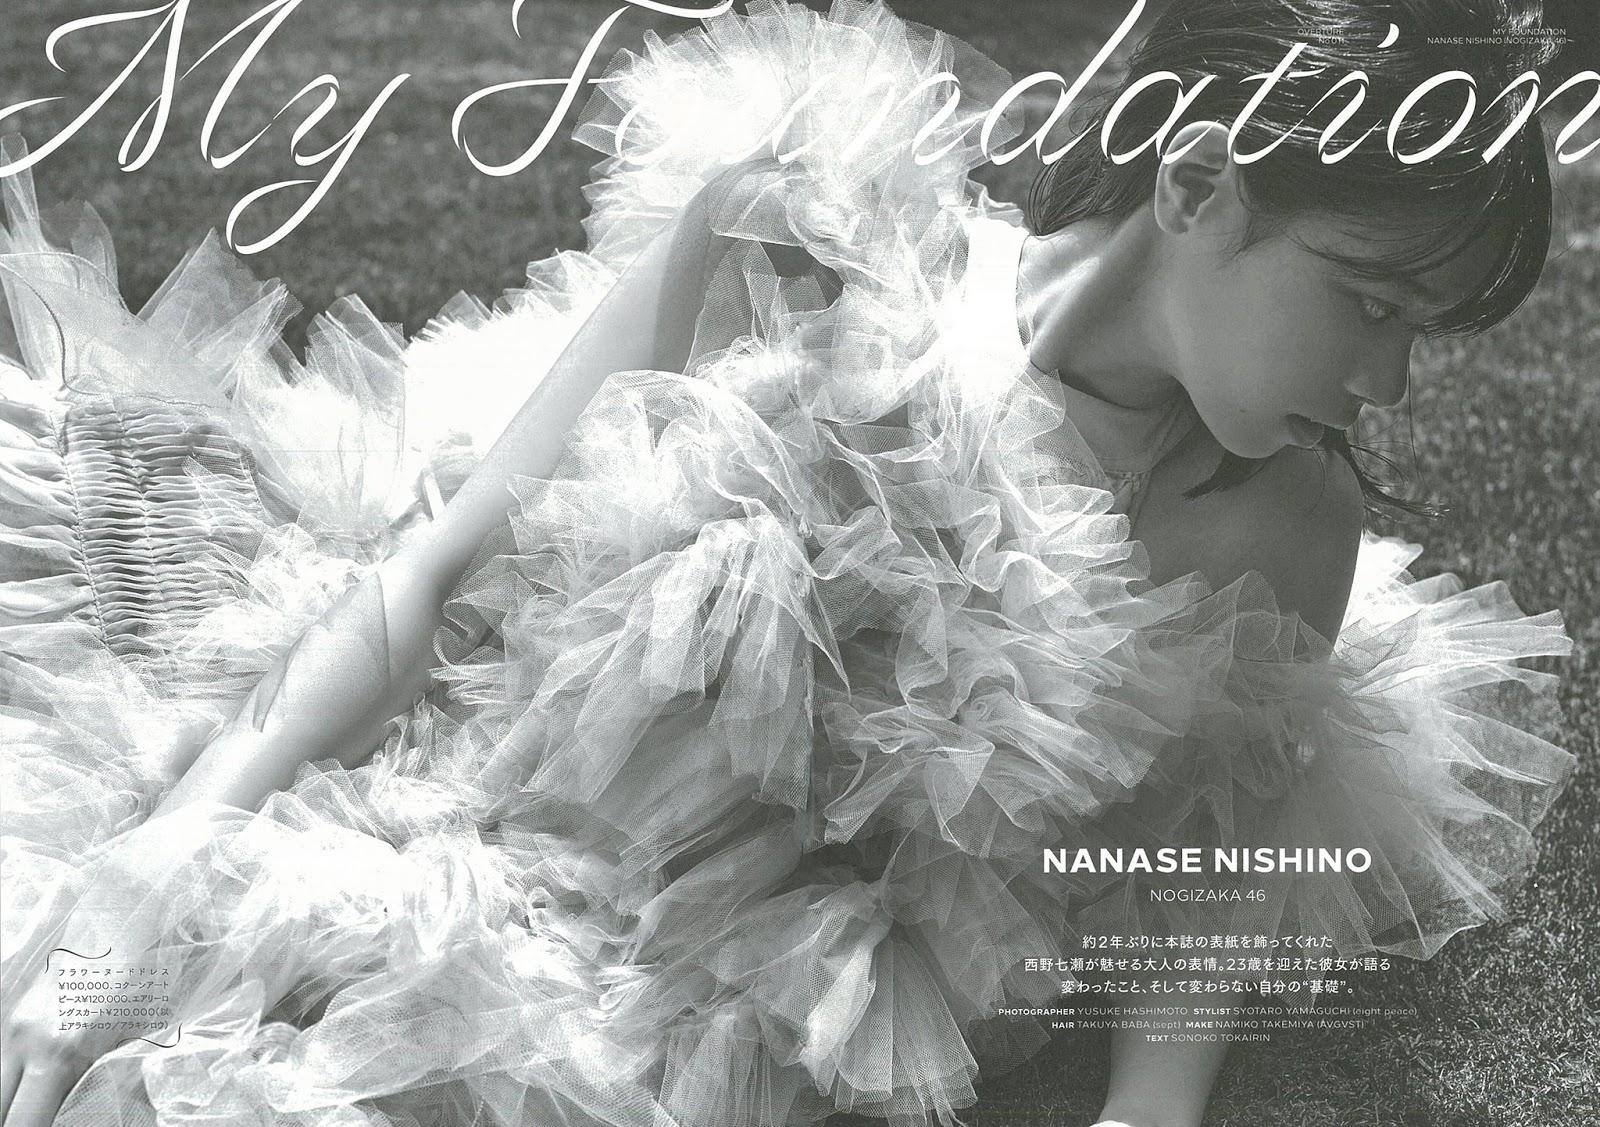 Nishino Nanase 西野七瀬, OVERTURE 2017.06 No.011